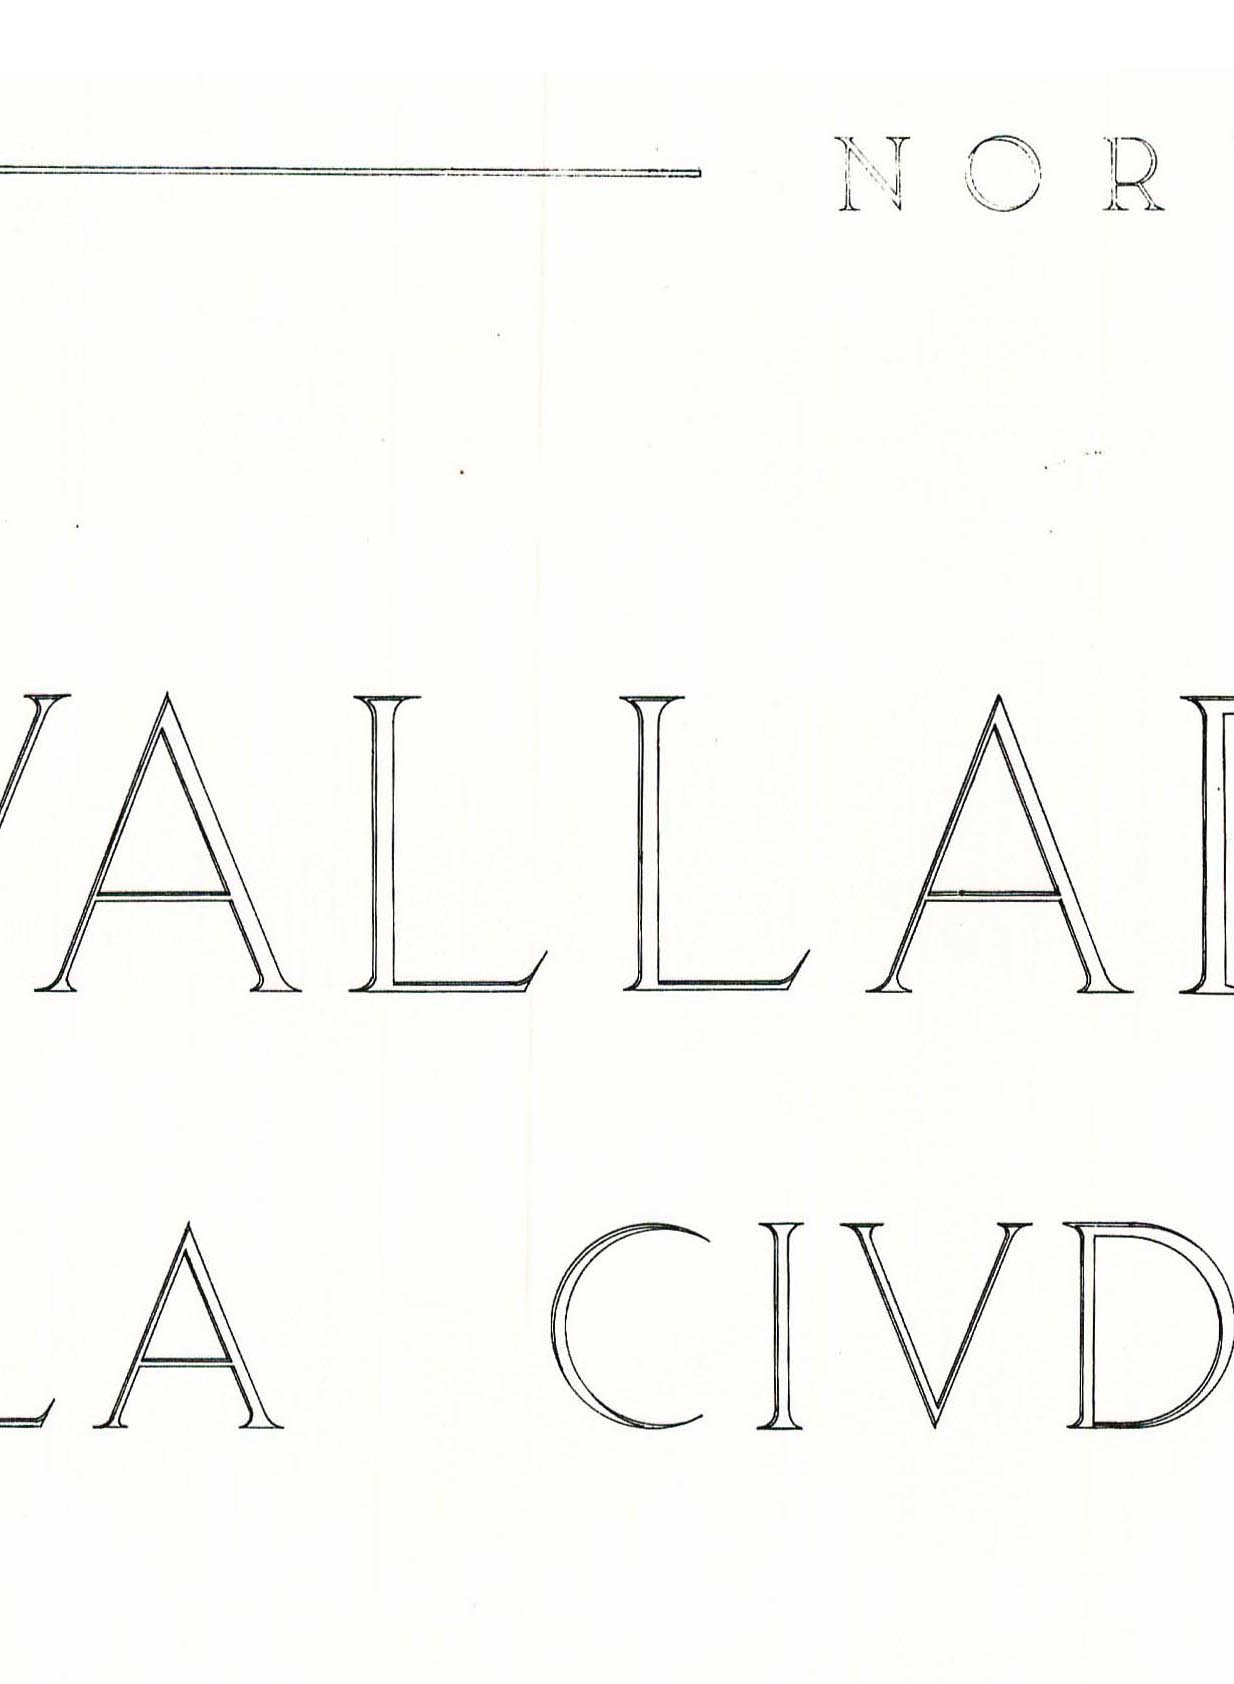 danielvillalobos-valladolid-blueprints-renaissance-a.5